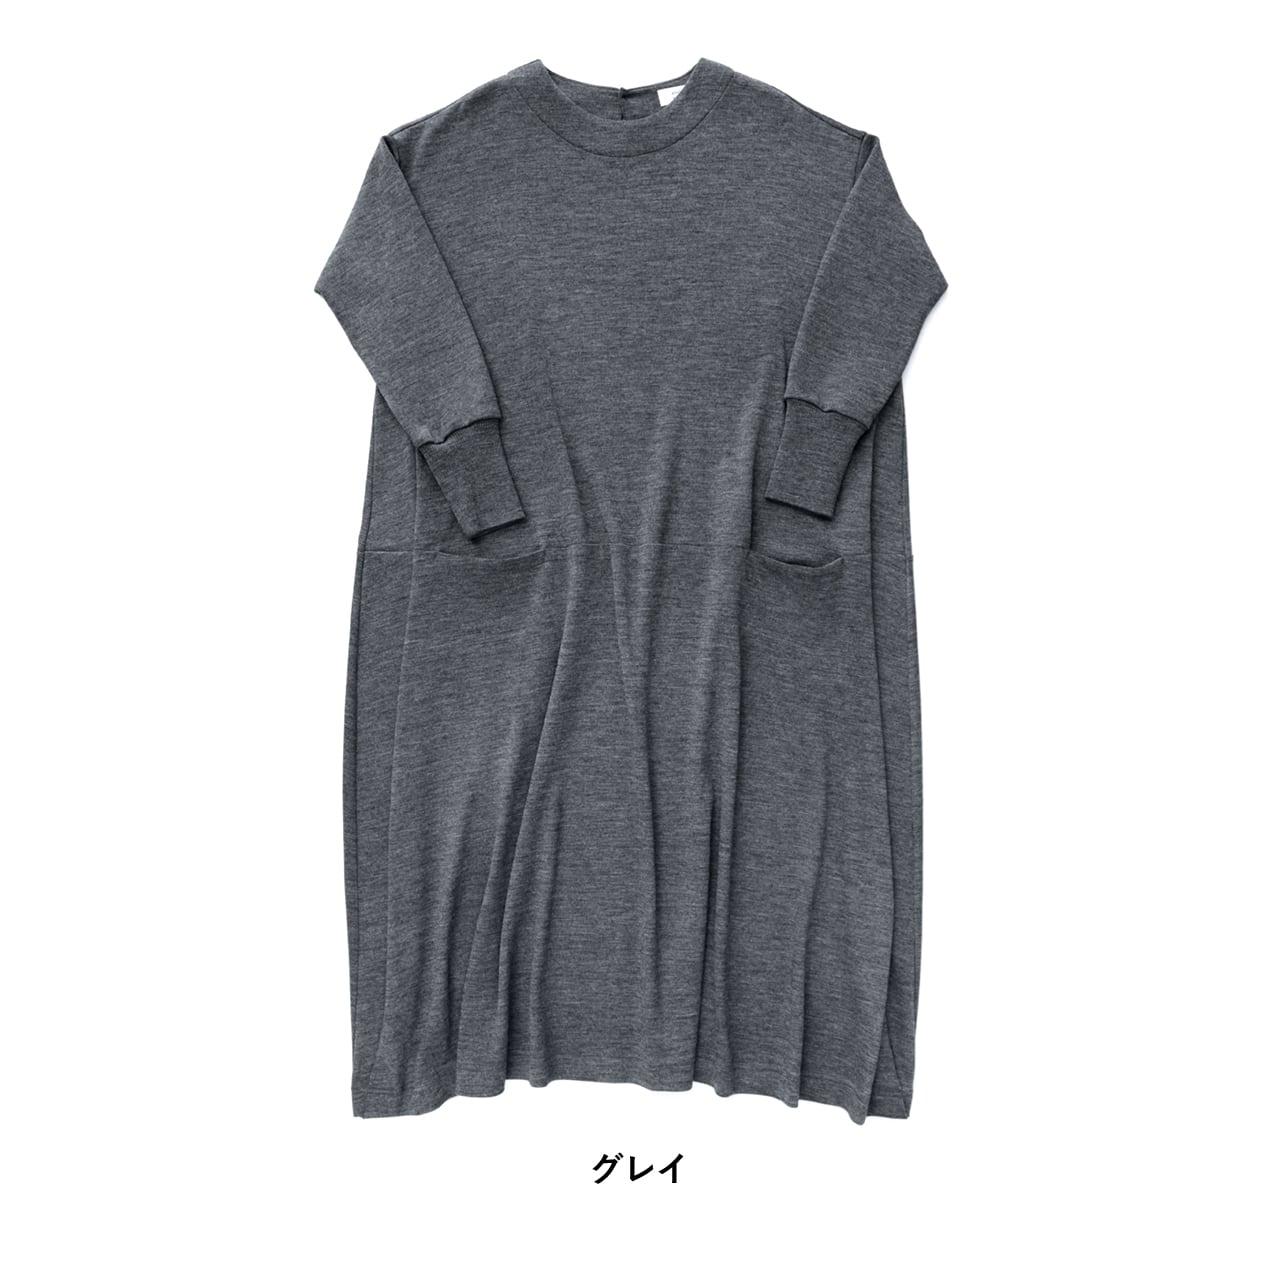 atelier naruse wool cocoon knit one piece/ アトリエナルセ ウールコクーンニットワンピース